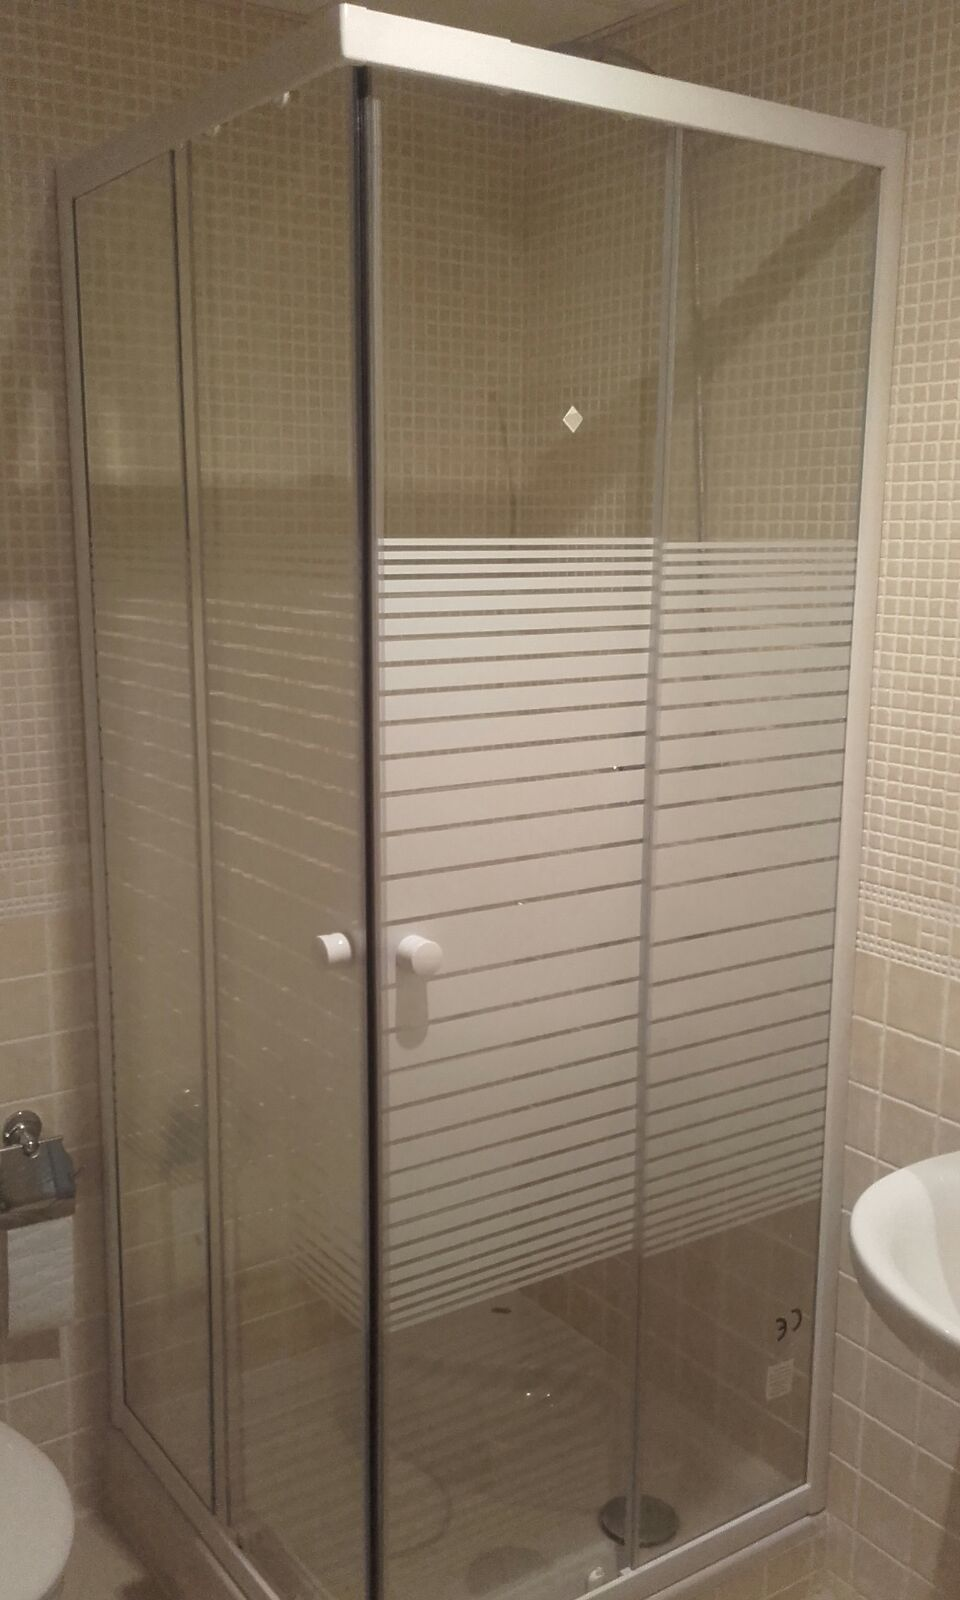 Montaje de Mampara baño